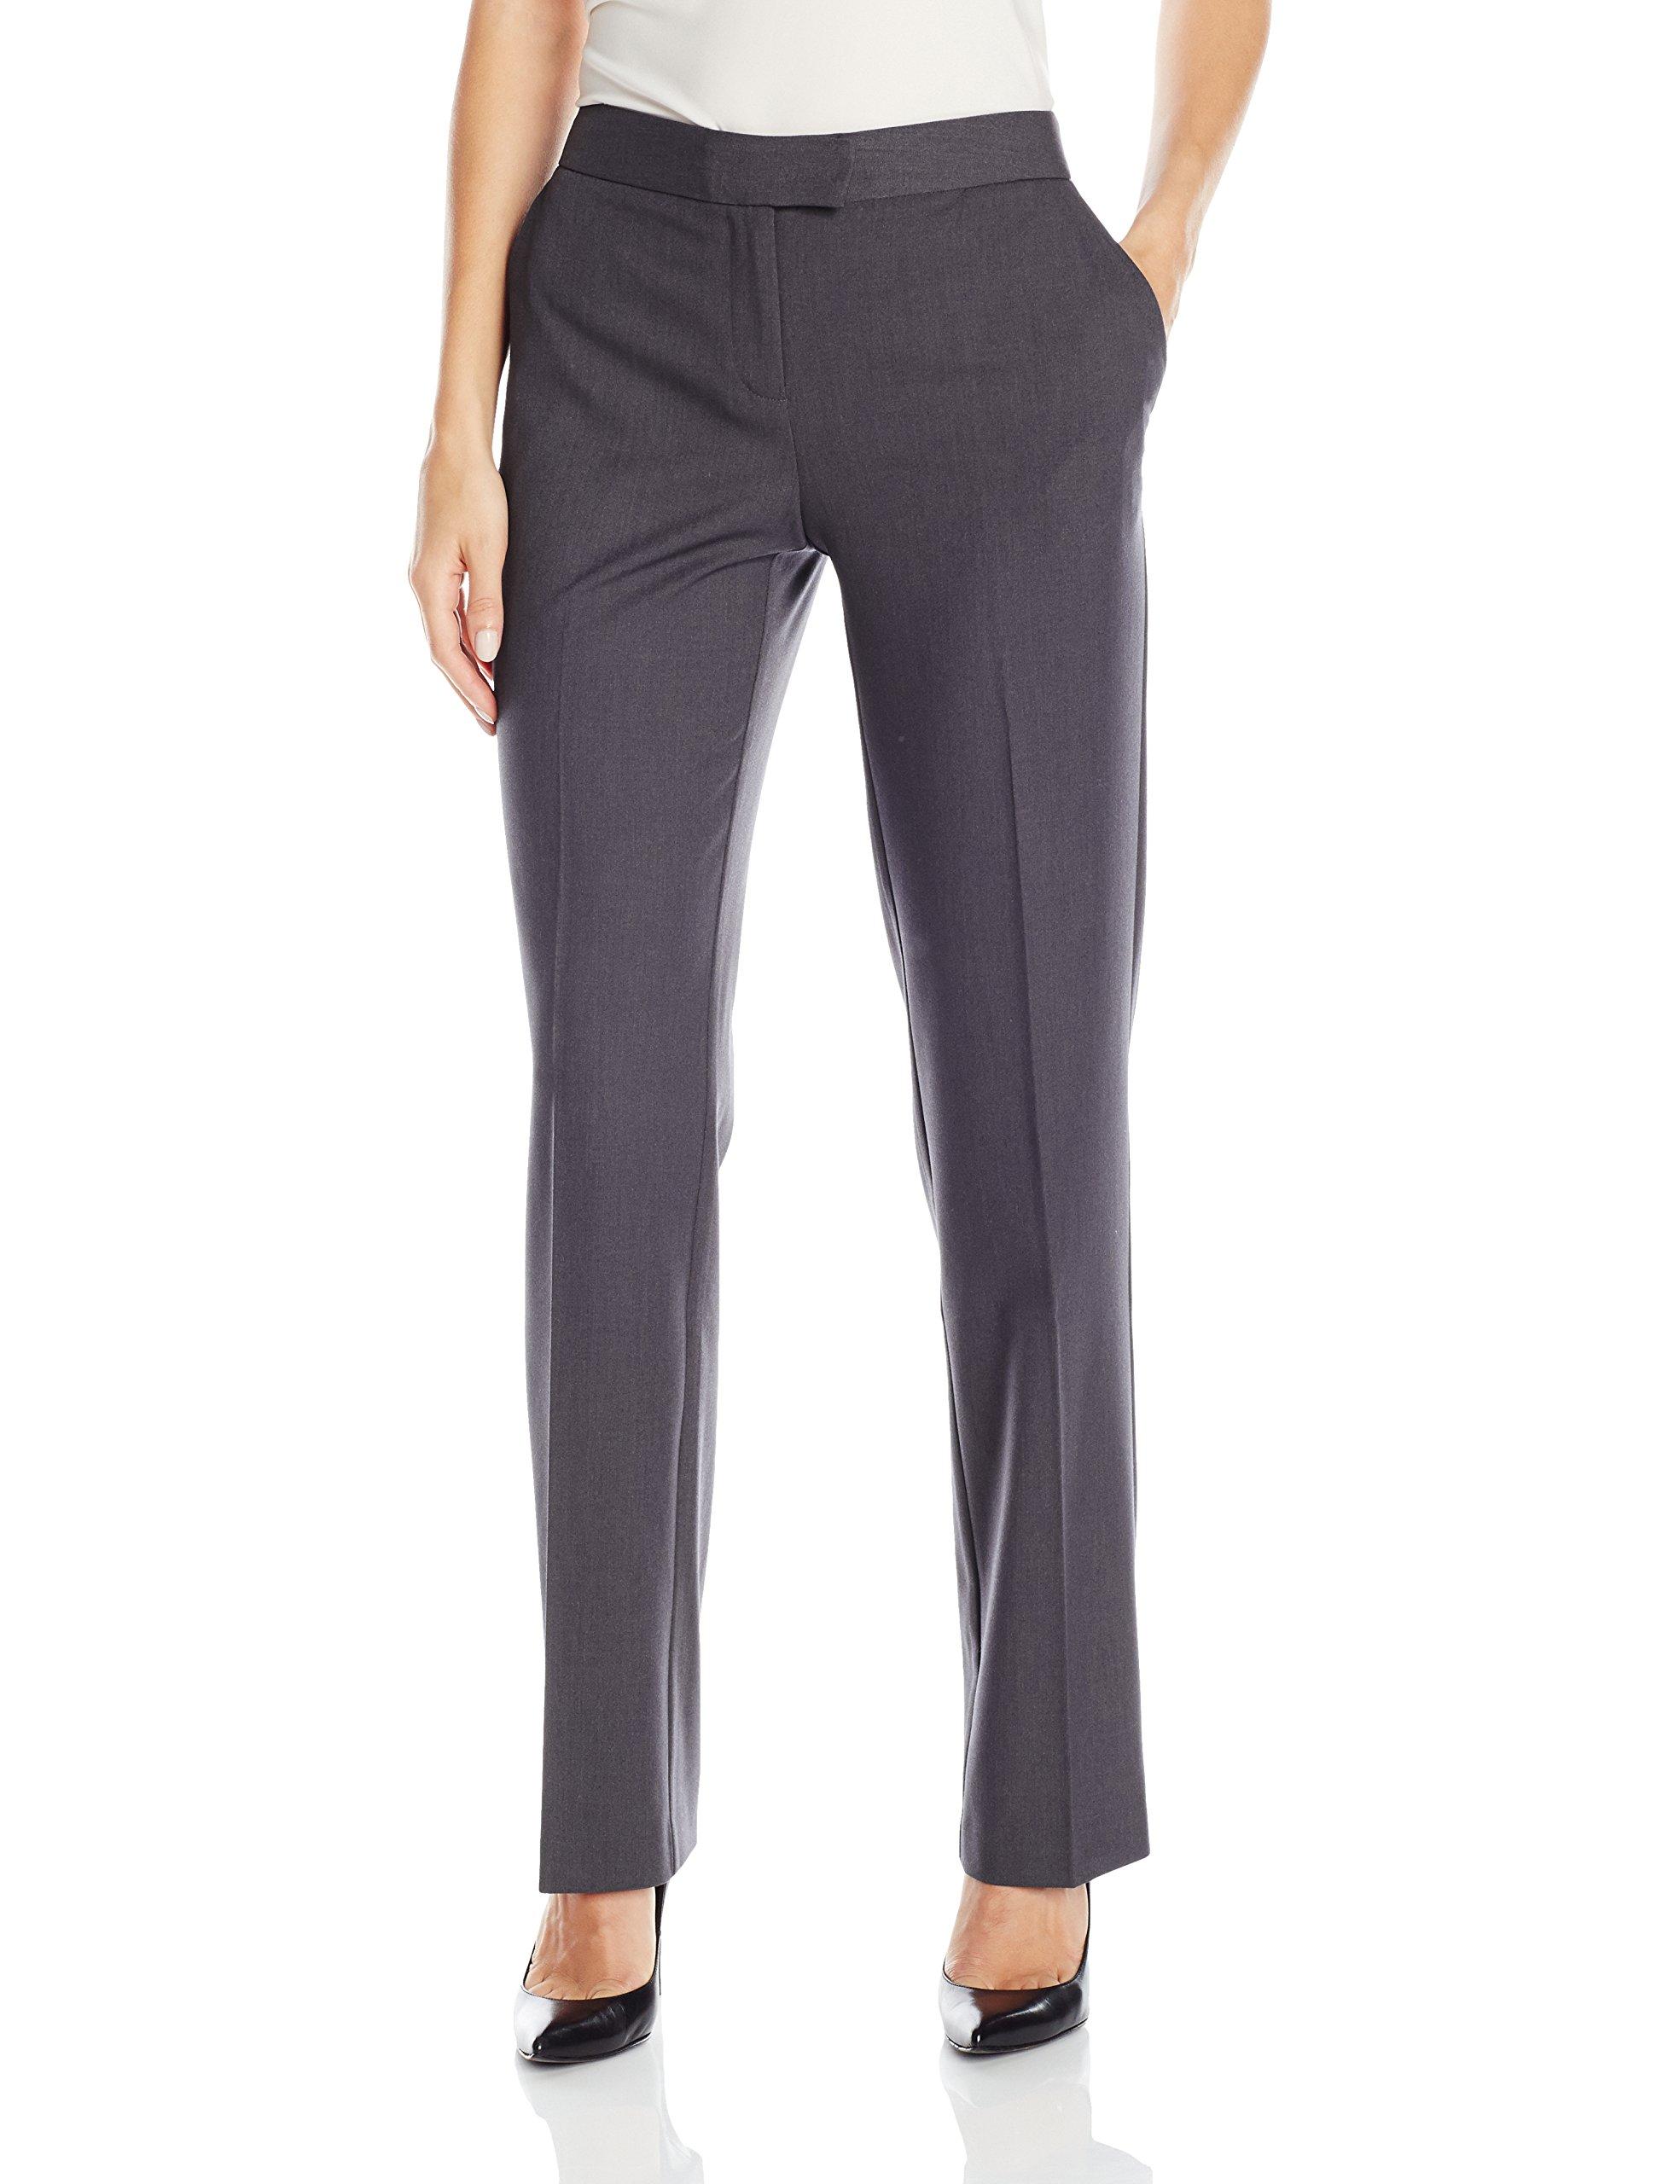 Jones New York Women's Sydney Pant, Charcoal Grey Heather, 14